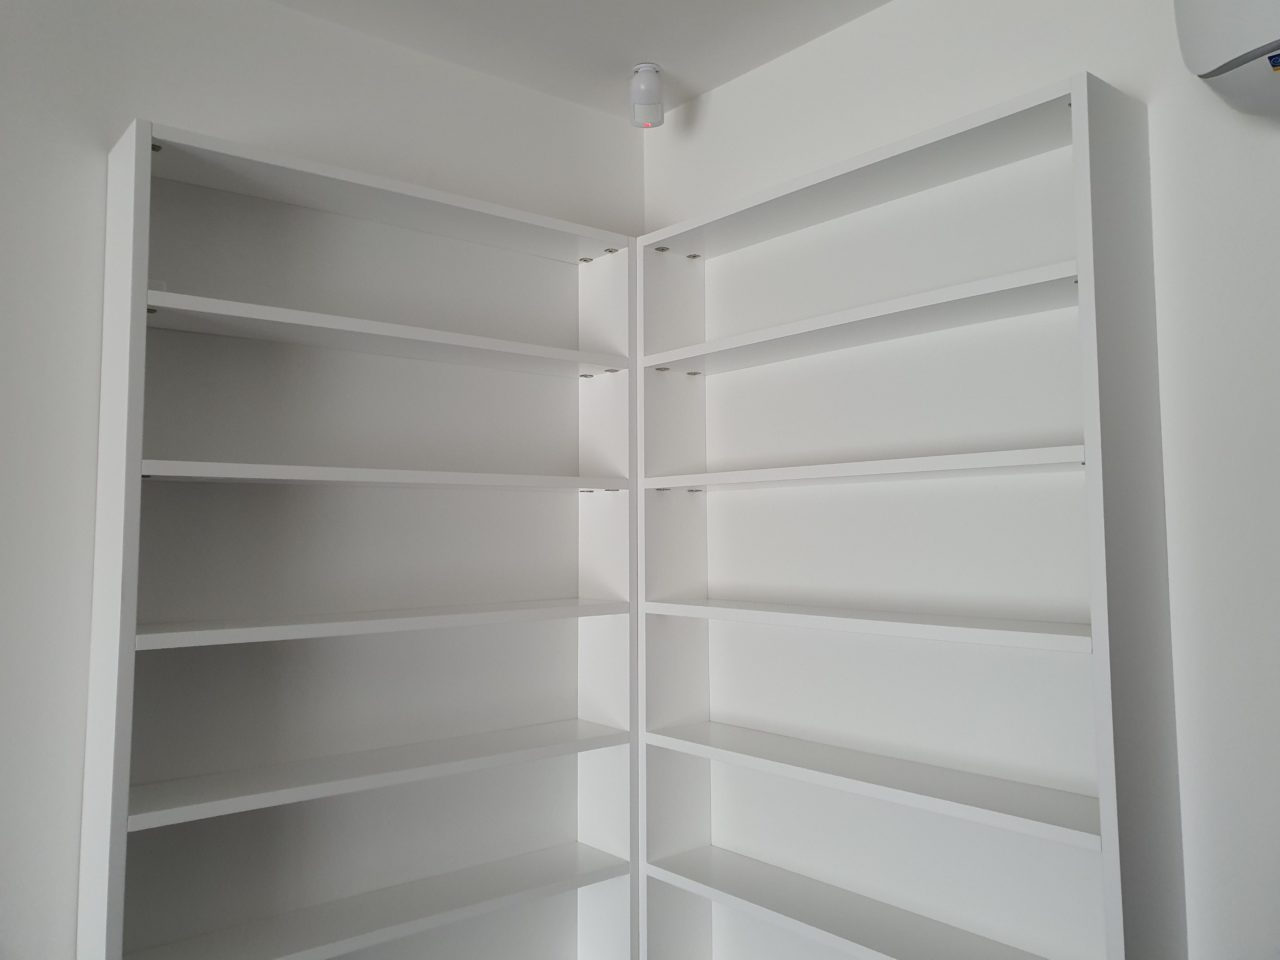 Librerie laccate